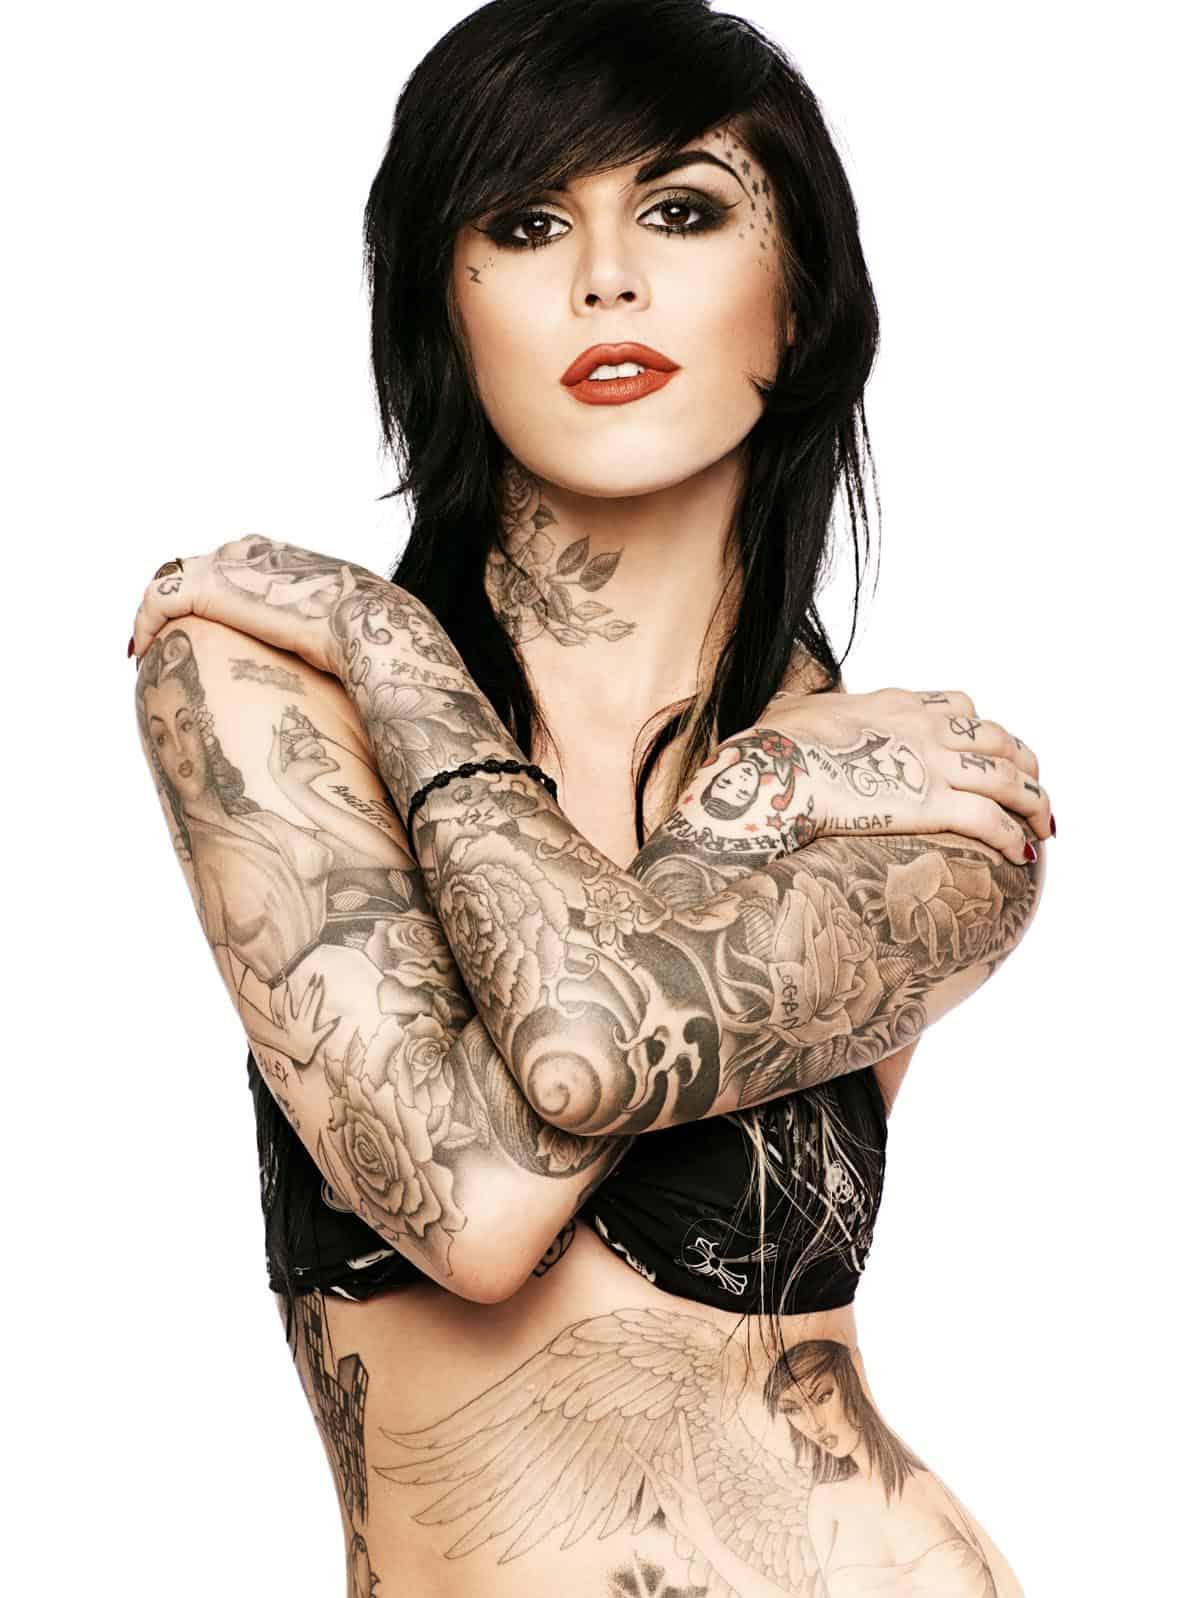 her Jesse James tattoo or